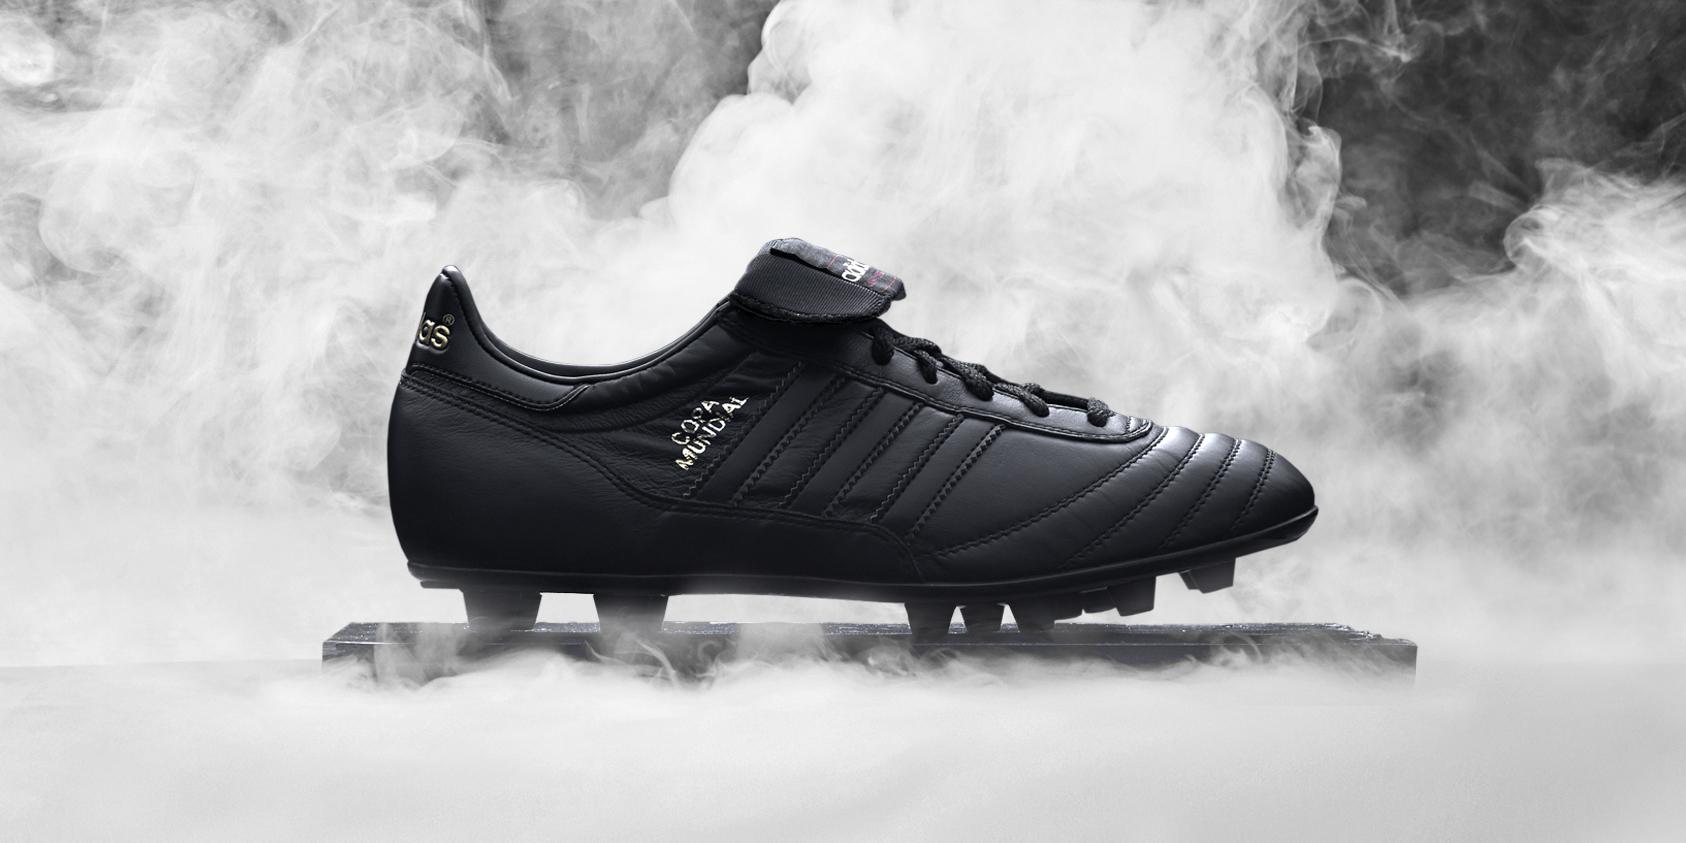 b10de626c48 ... football boots ever invented. Adidas Football B W Copa Black Hero 01.  Adidas Football B W Copa Black Hero 02.  Adidas Football B W Copa Black Hero 03